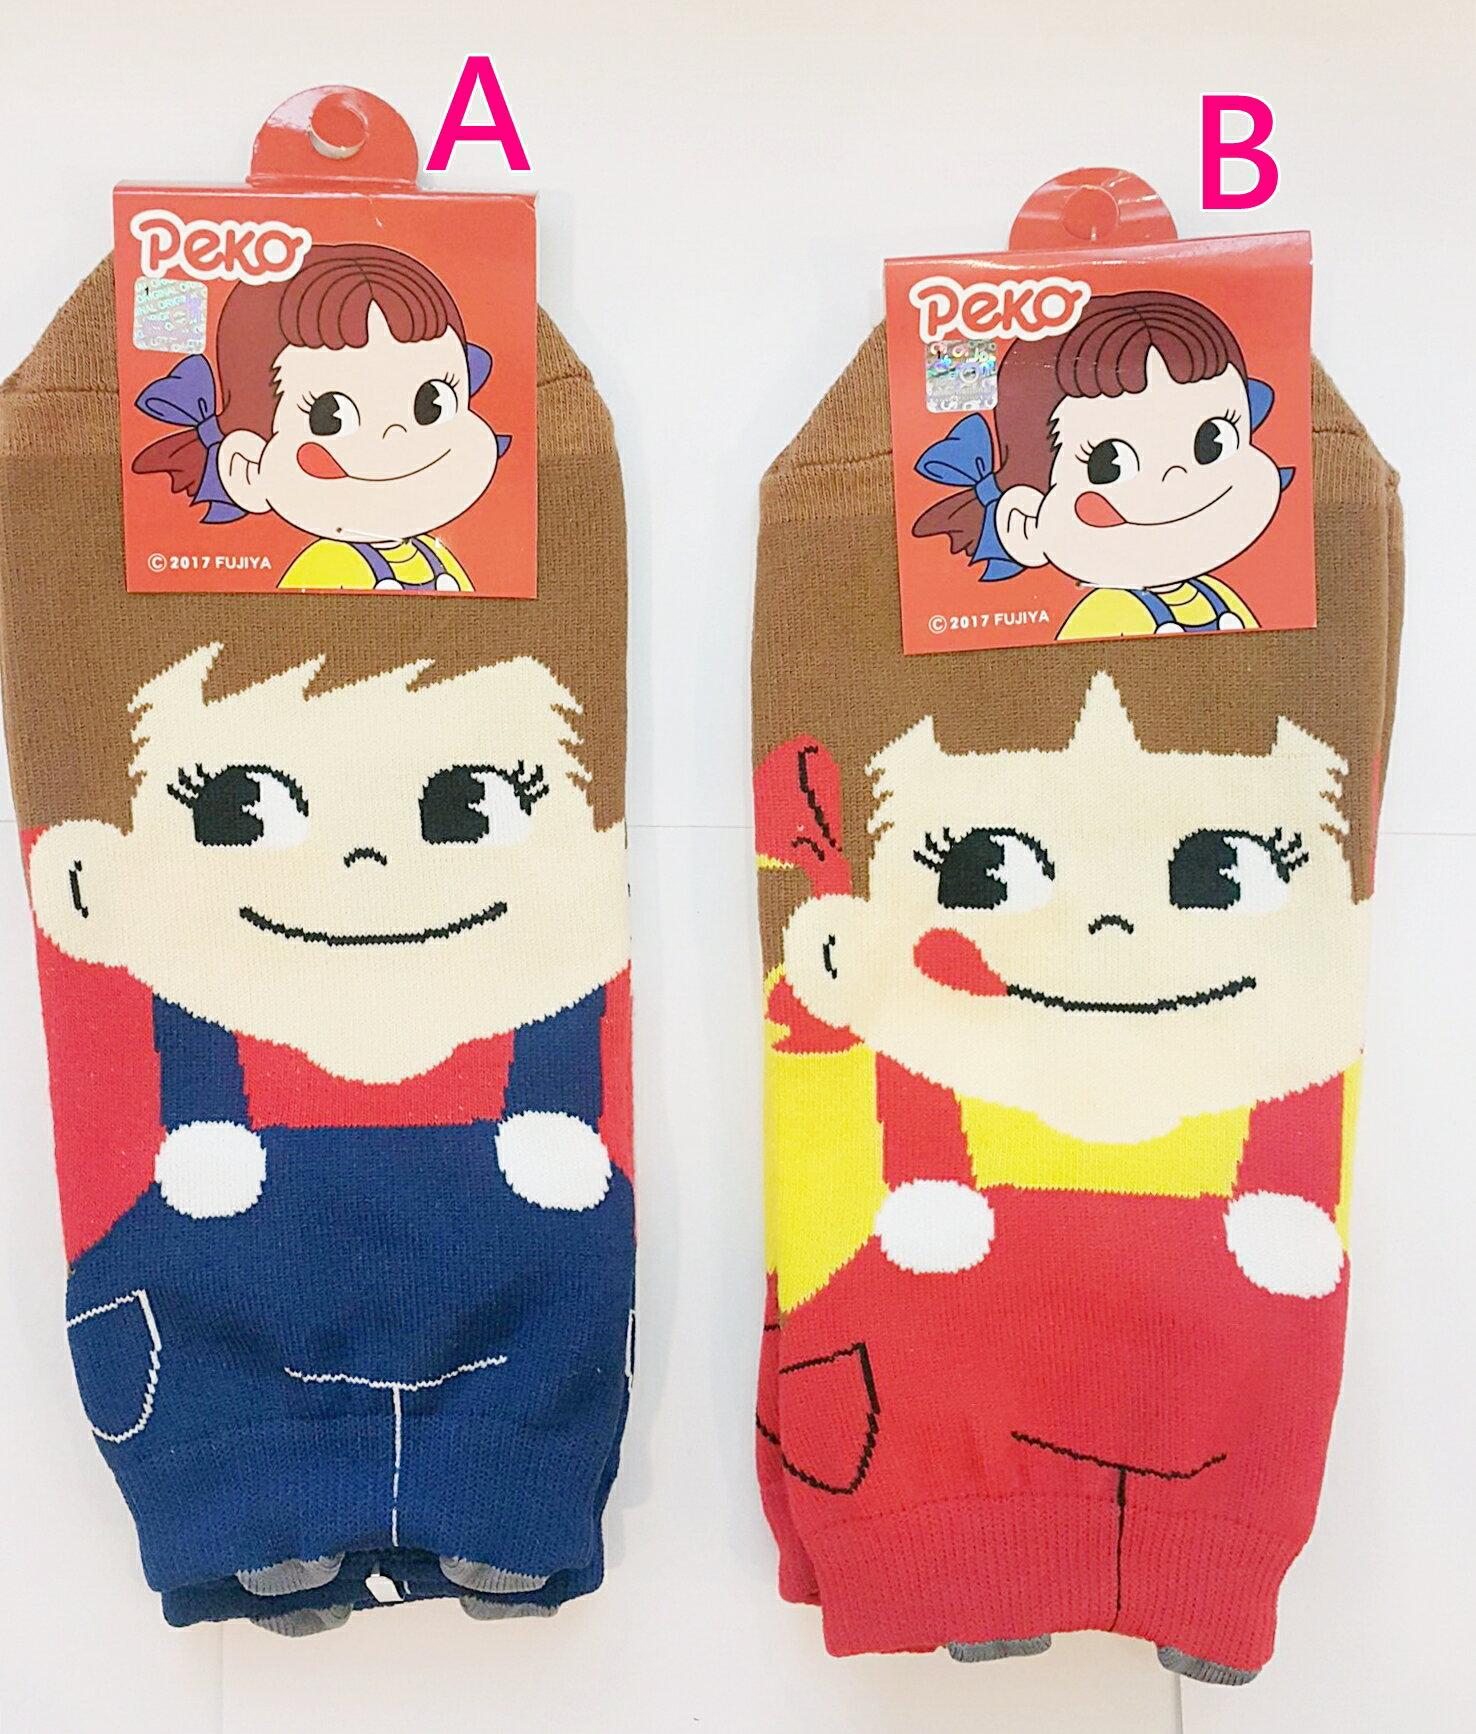 X射線【C190003】KIsssocks 不二家牛奶妹短襪(22-26cm)2款選1,大人/小孩短襪/船型襪/sanrio卡通/襪子